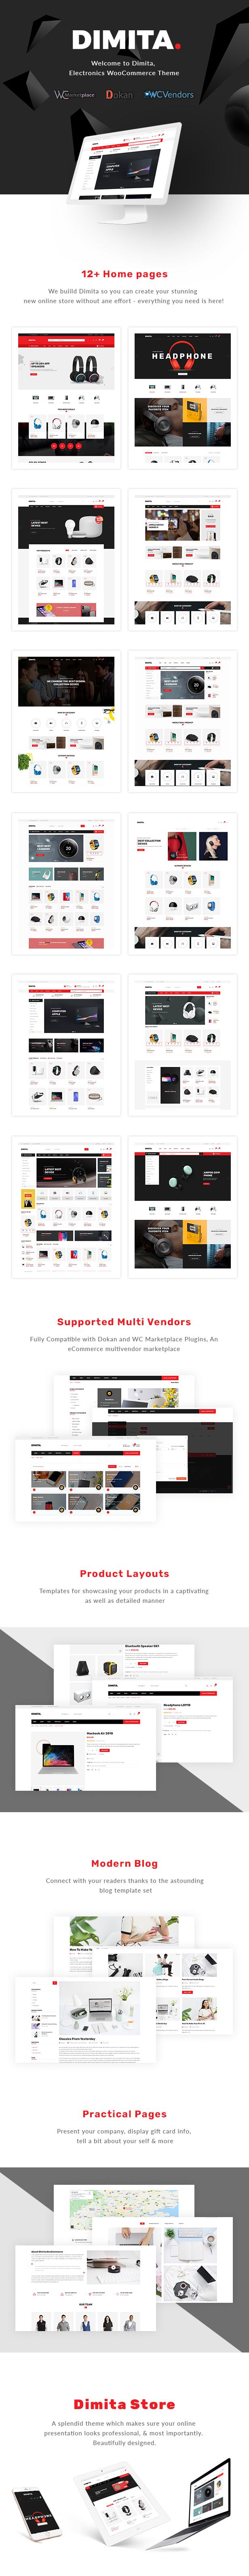 Dimita – Electronics WordPress Theme for WooCommerce - 2